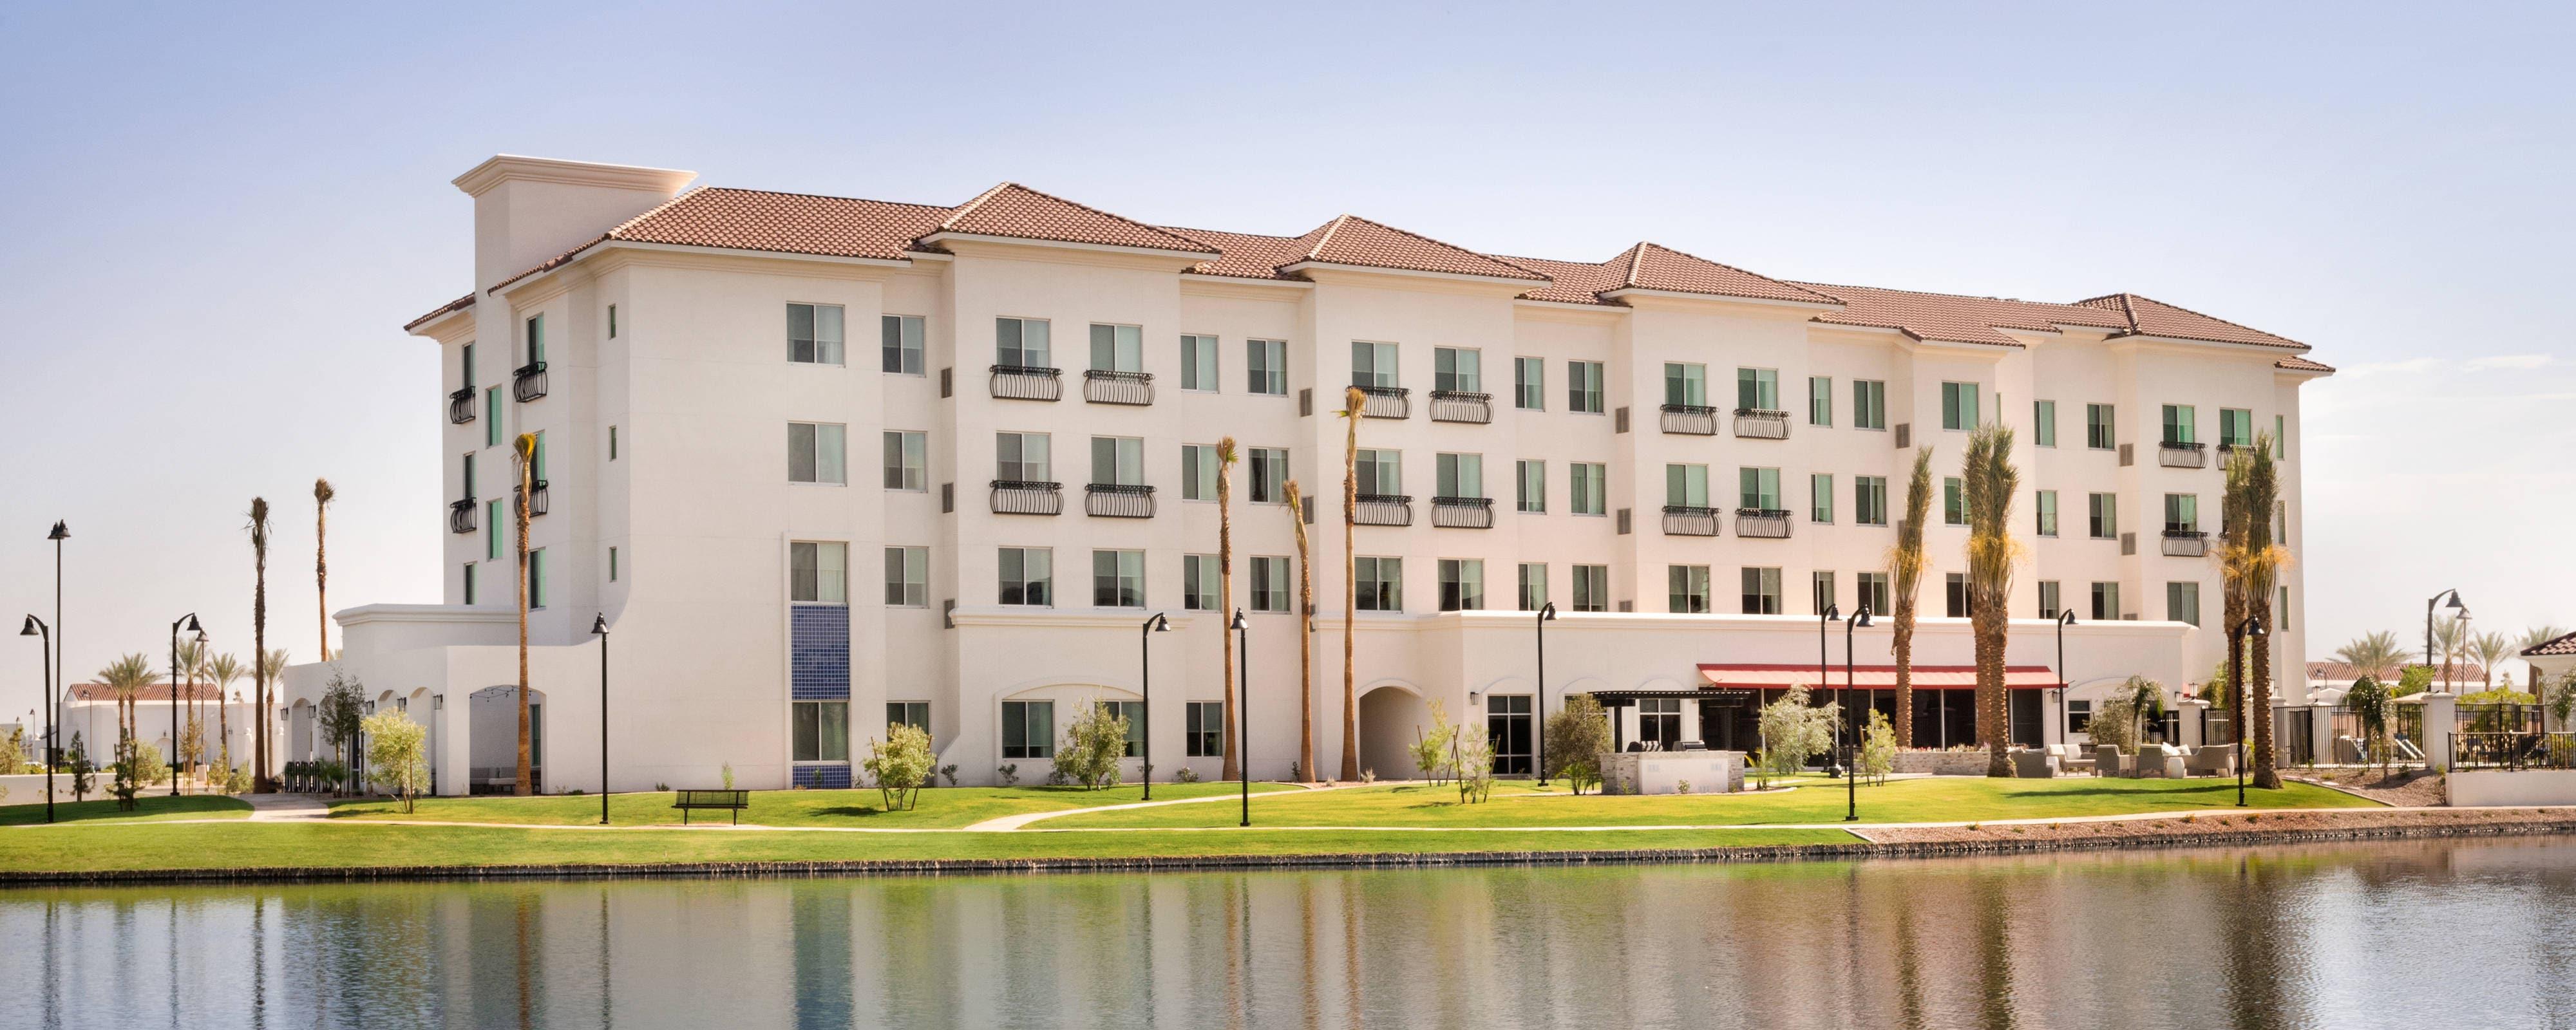 Residence Inn Phoenix Chandler South Hotels In Chandler Az